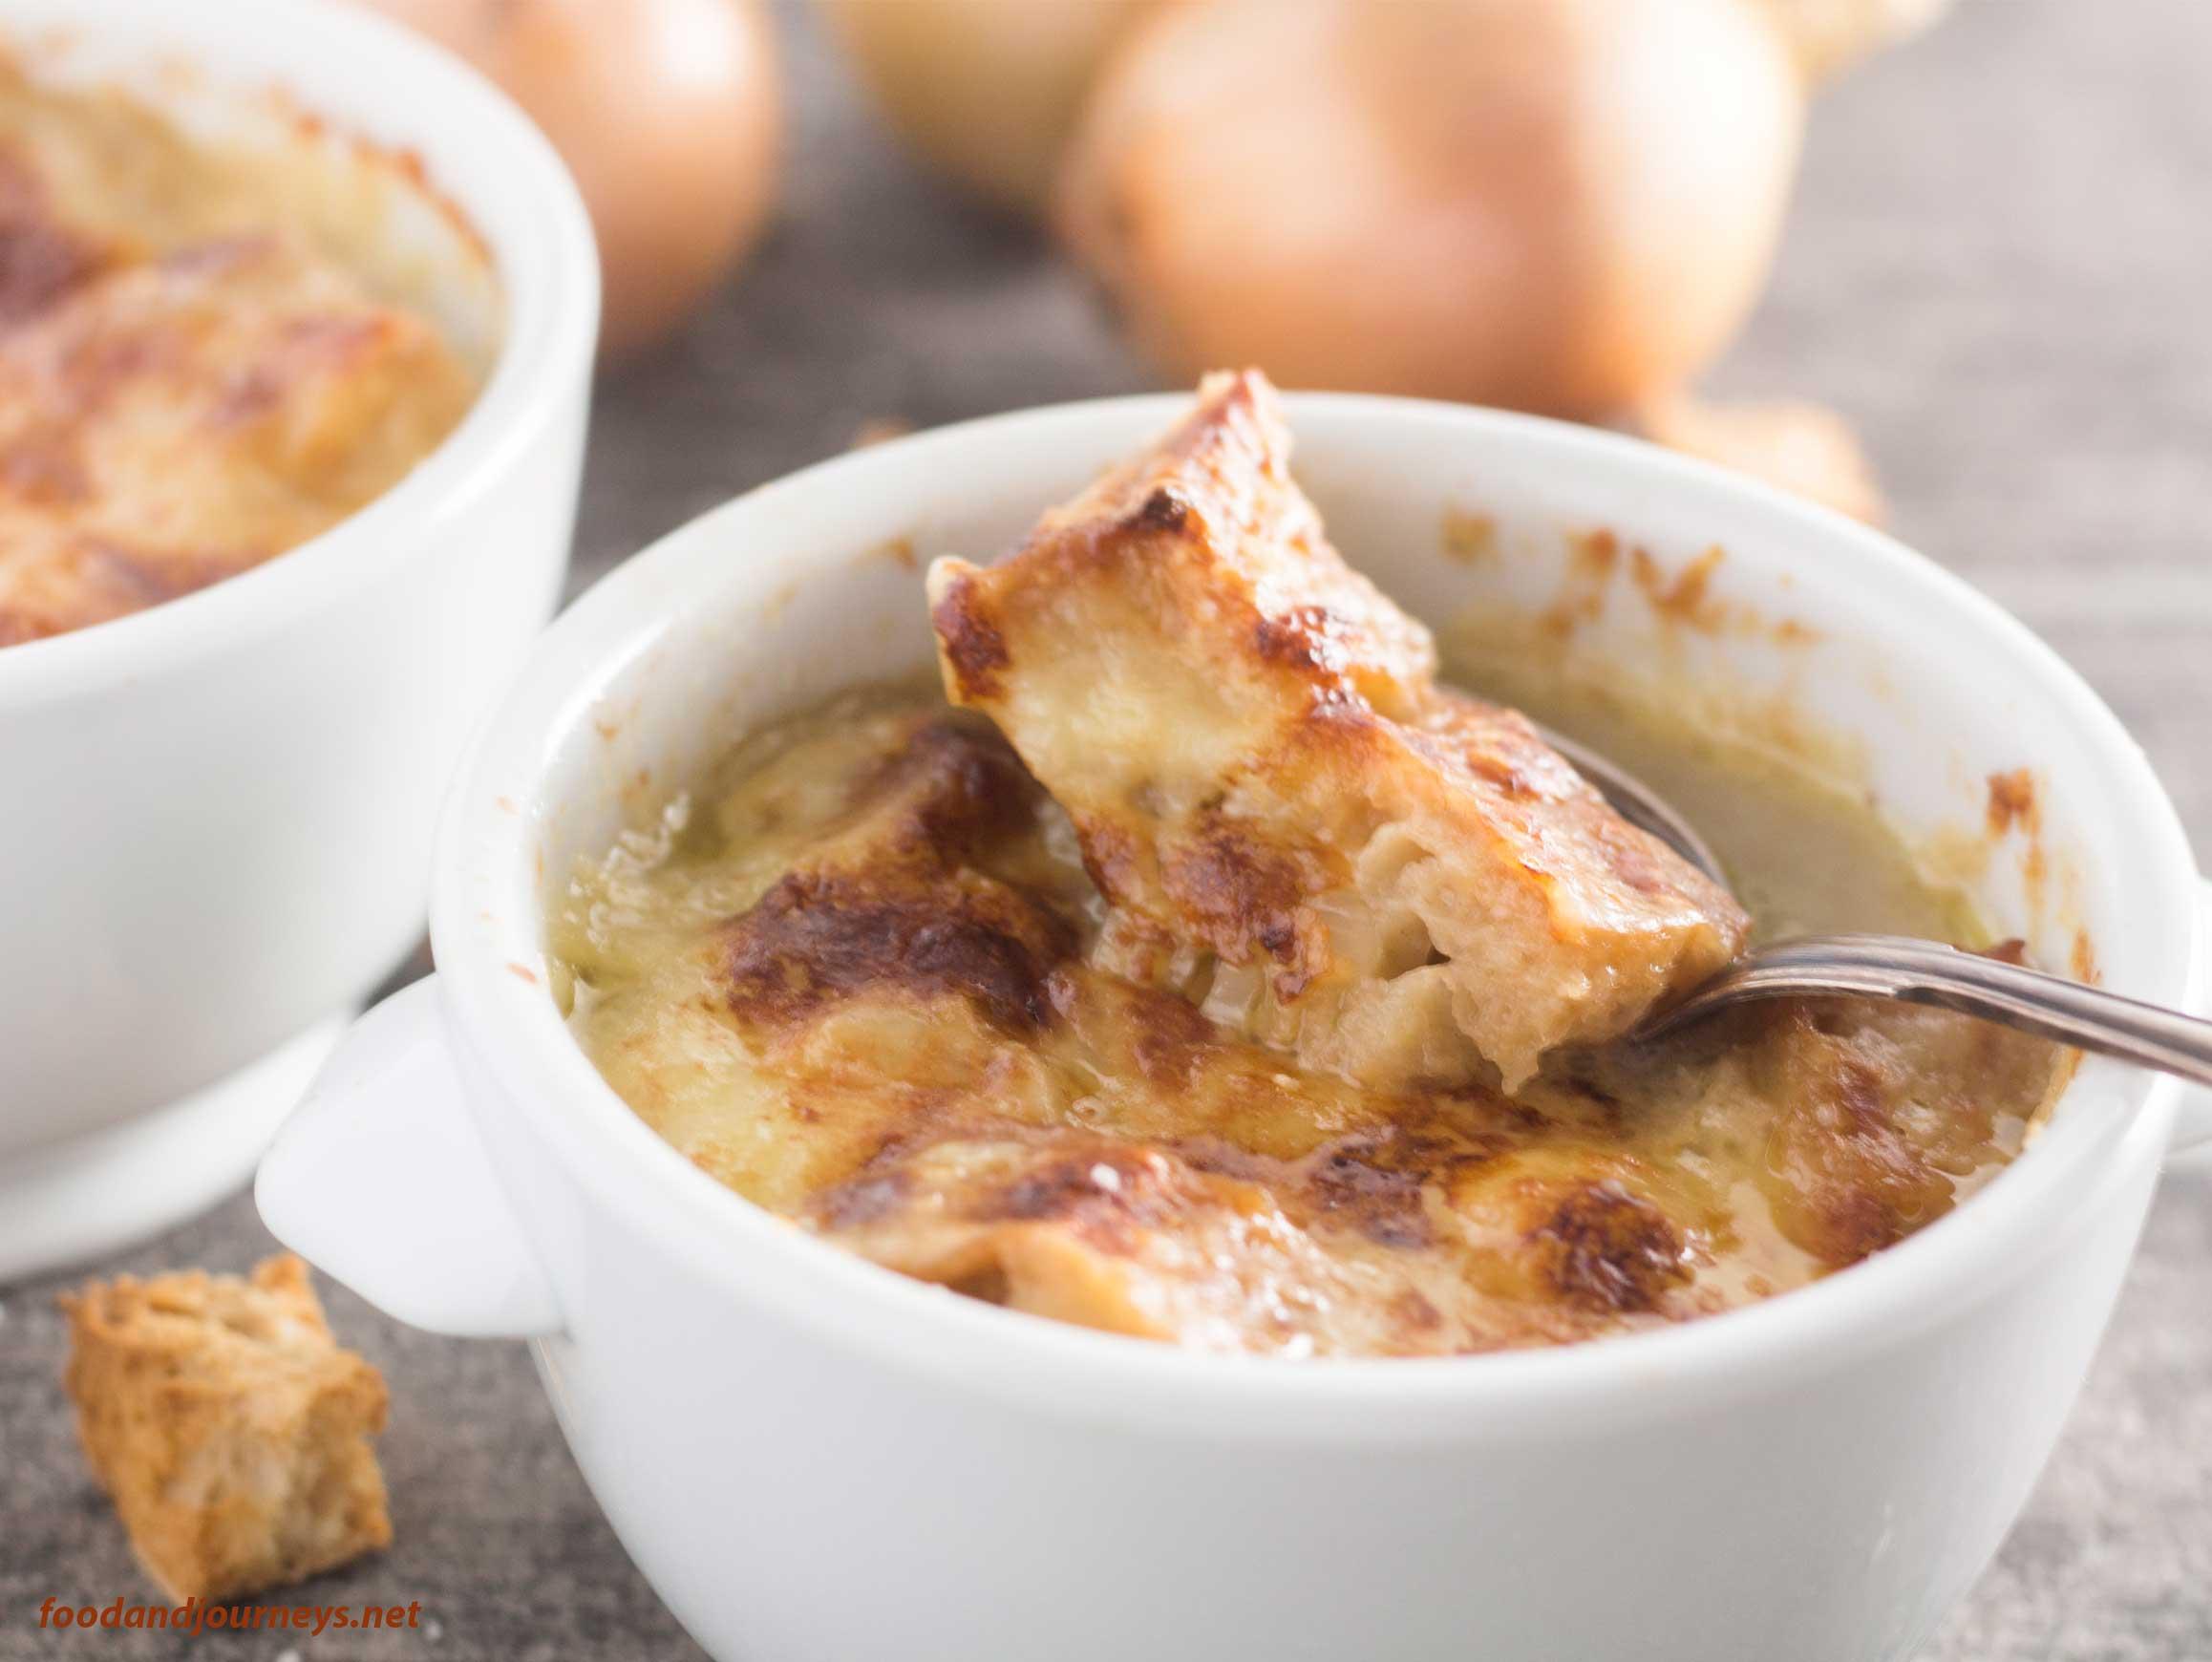 An image showing a spoonful of onion soup gratin|foodandjourneys.net